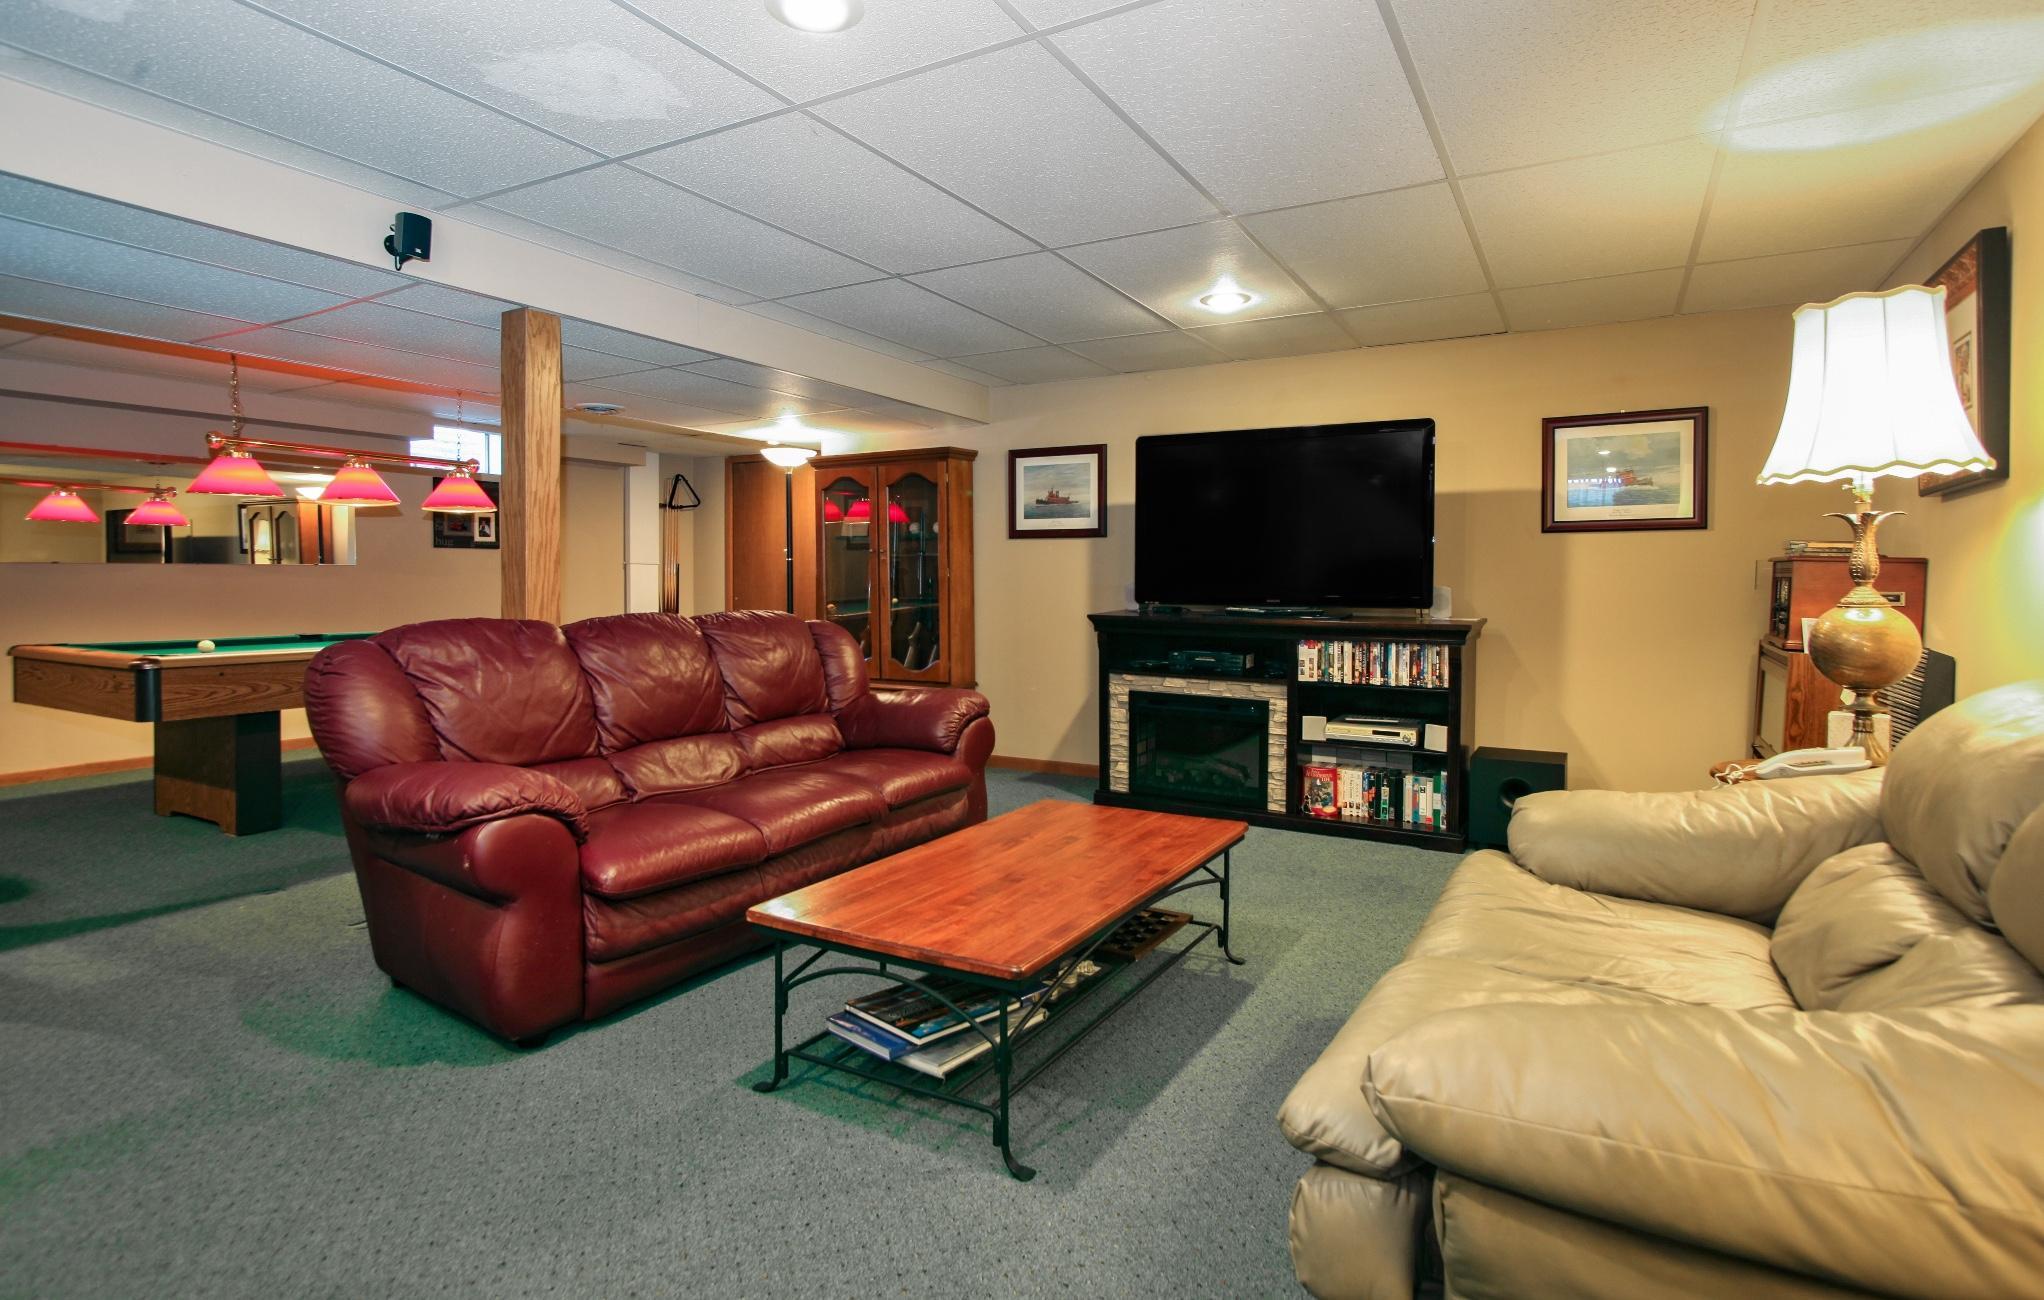 2221 Stony Ridge Dr, Waukesha, Wisconsin 53189, 3 Bedrooms Bedrooms, 8 Rooms Rooms,2 BathroomsBathrooms,Single-Family,For Sale,Stony Ridge Dr,1618379